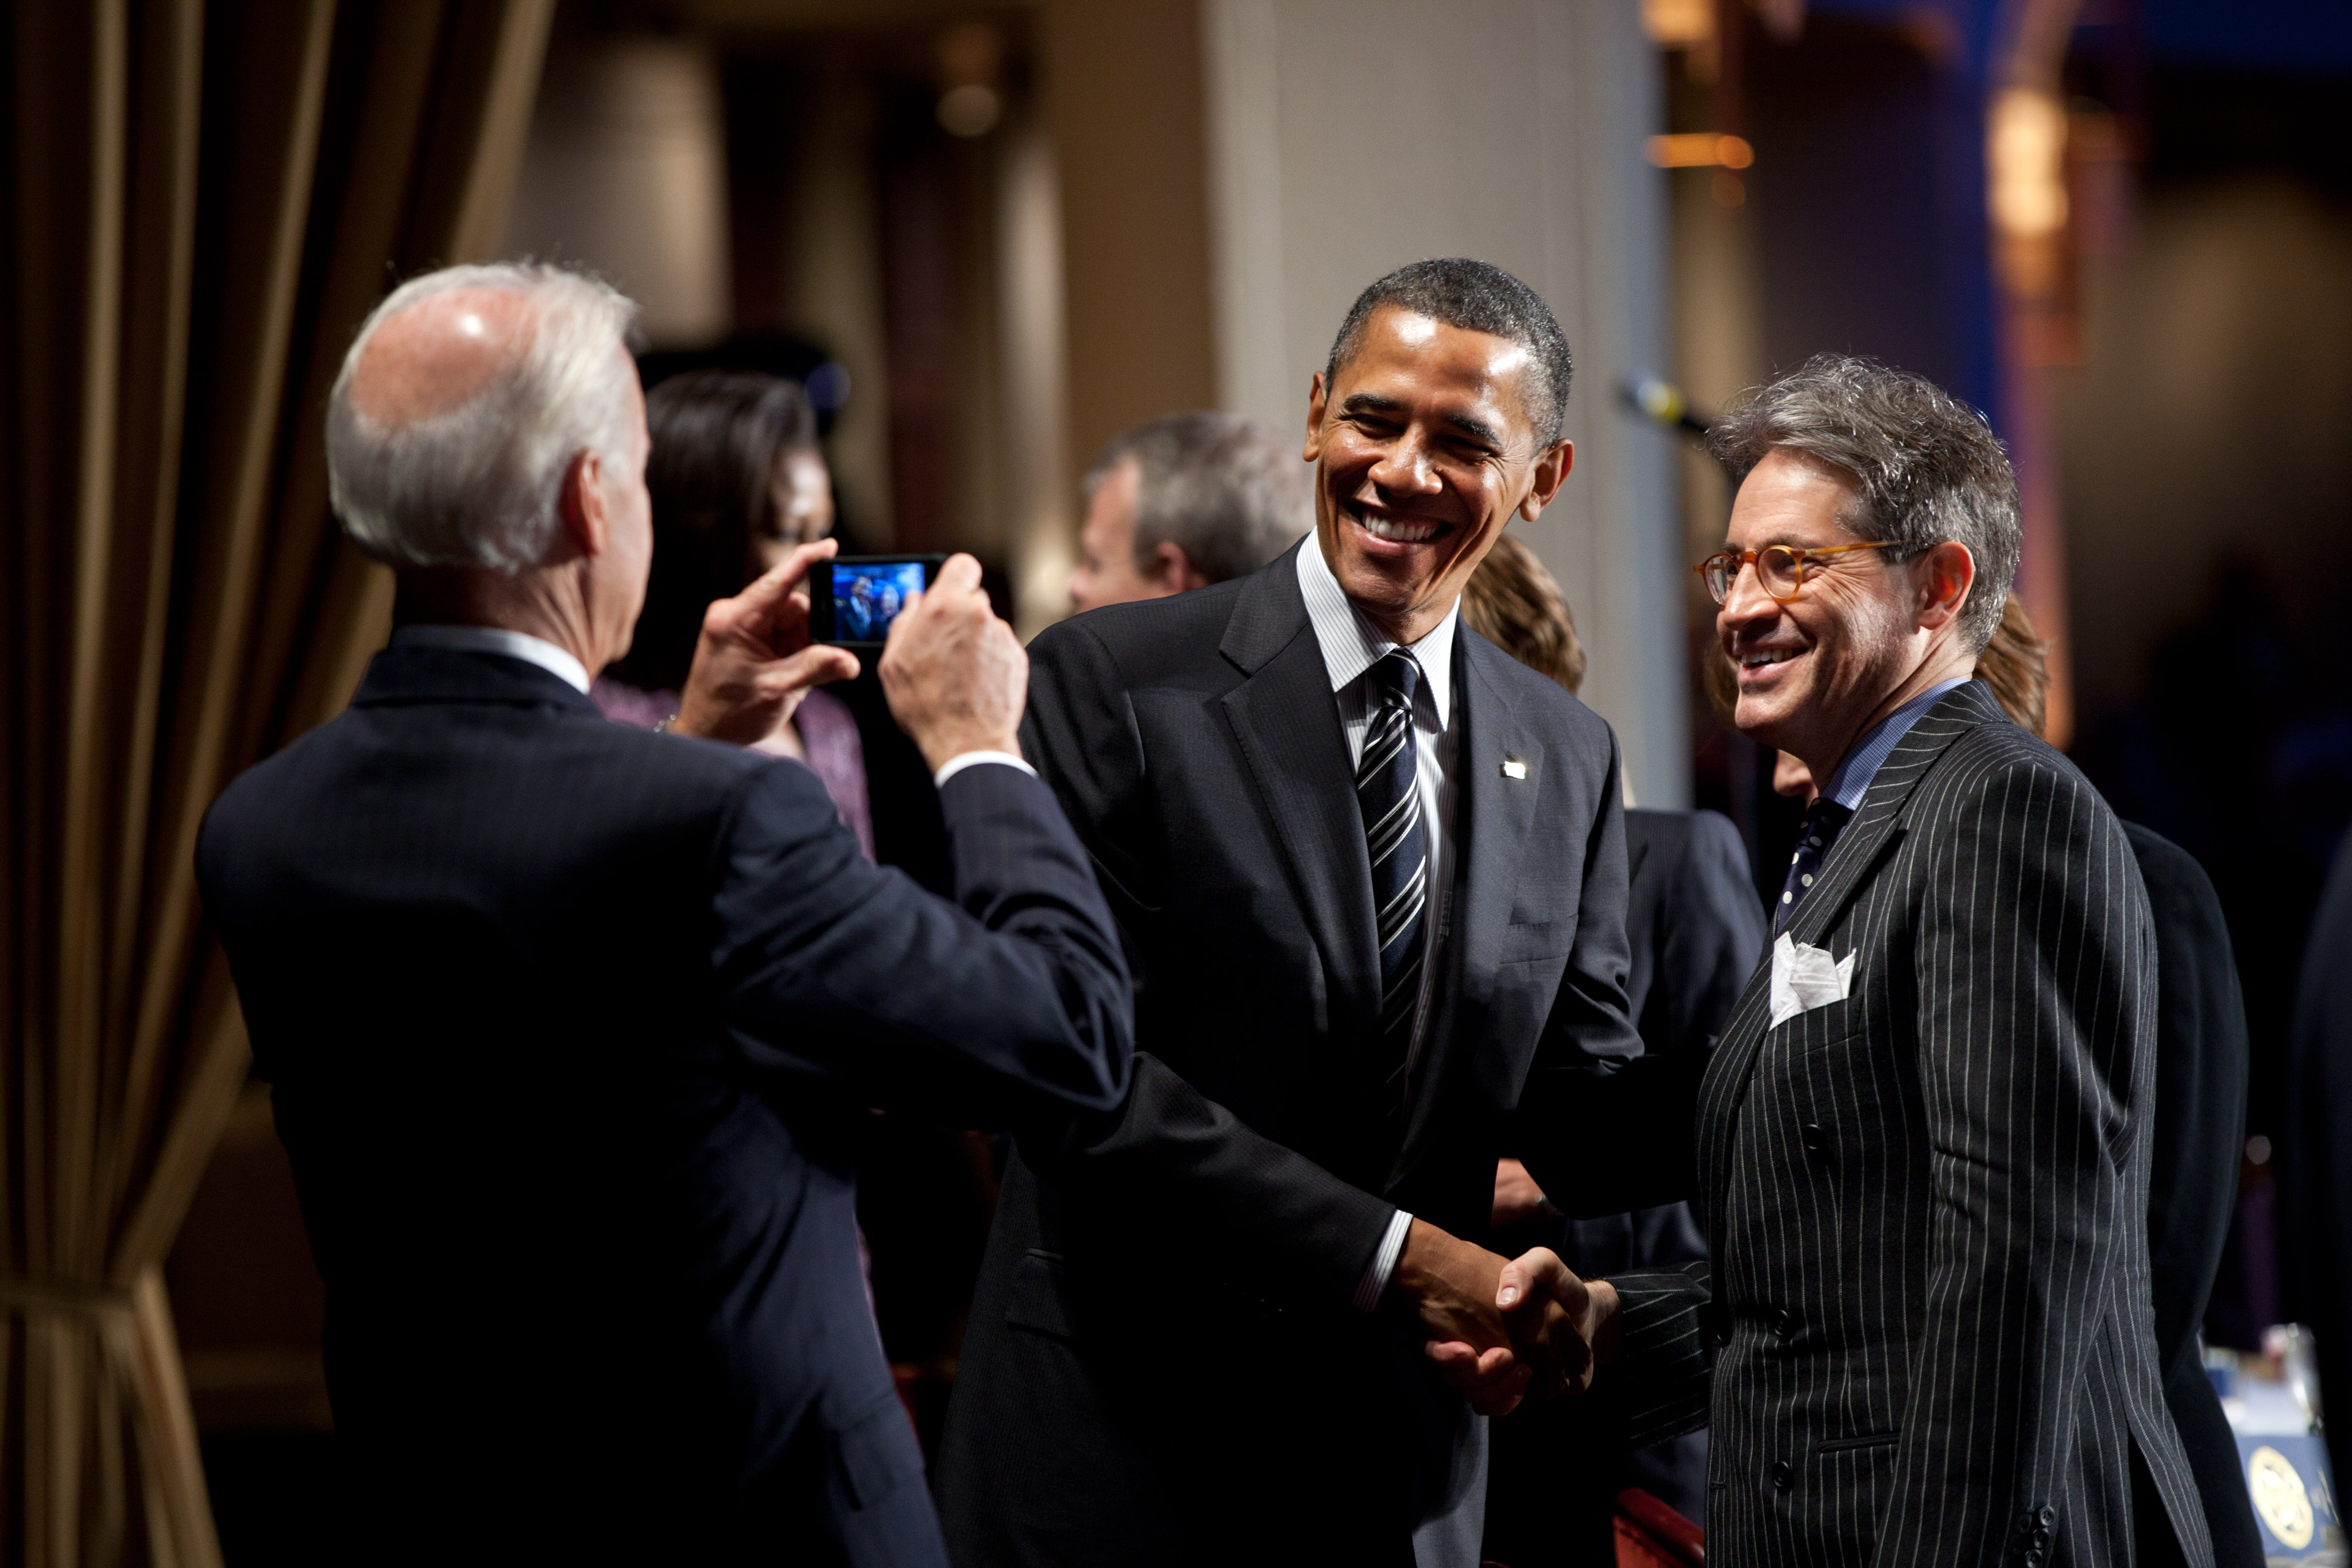 National Prayer Breakfast >> File:Eric Metaxas with Barack Obama and Joe Biden.jpg - Wikimedia Commons